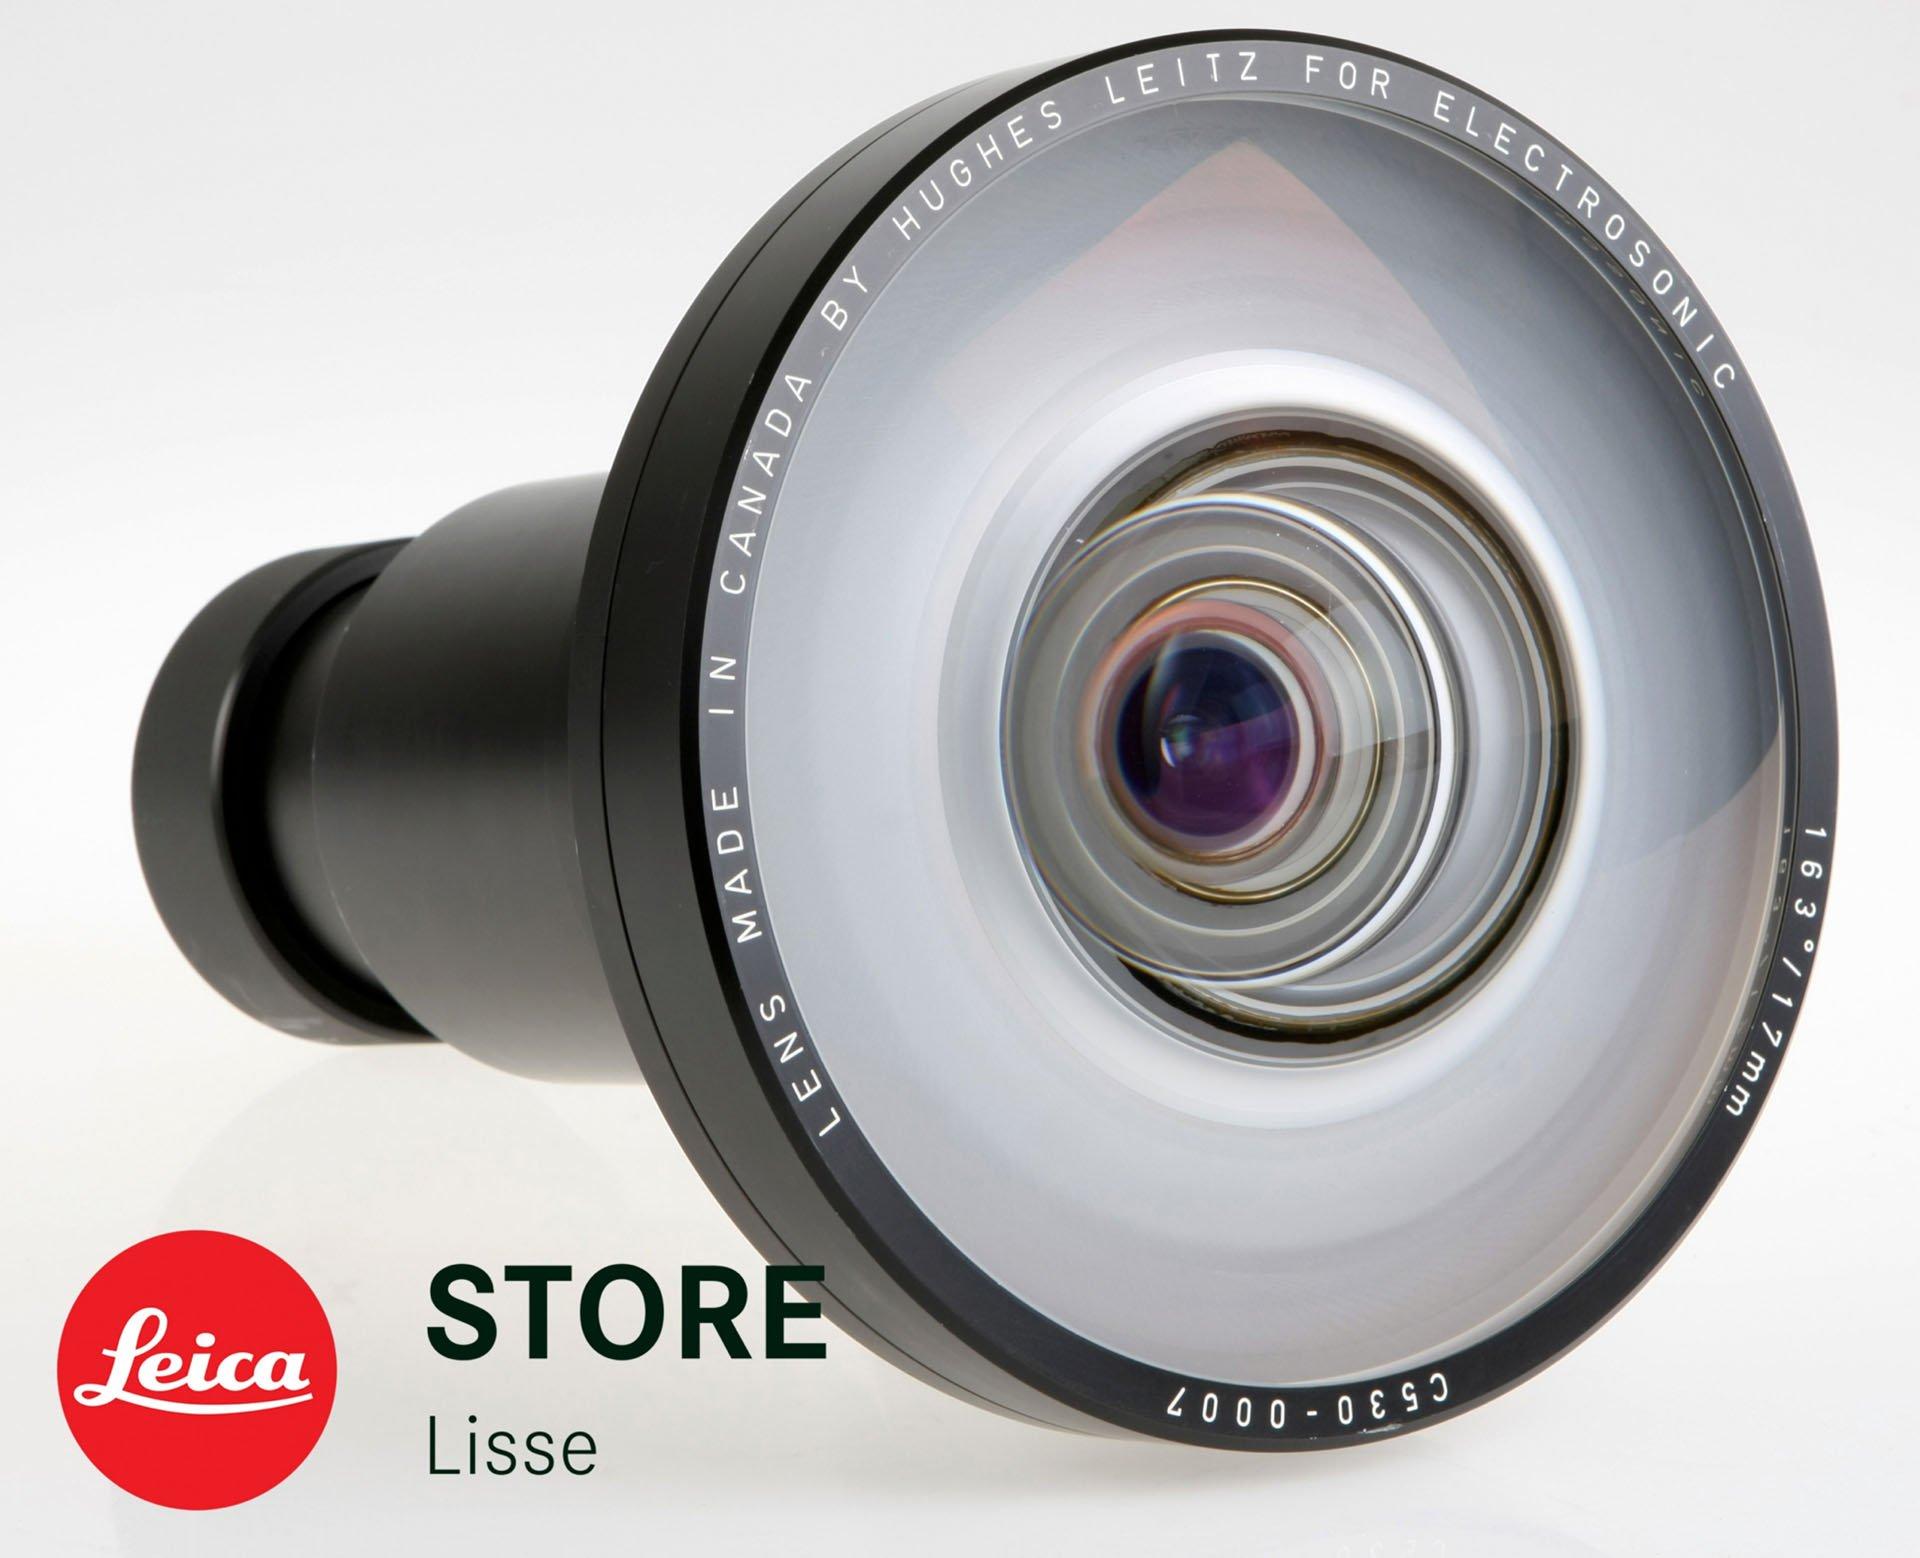 leica-store-lisse-hughes-leitz-17mm-f2-3